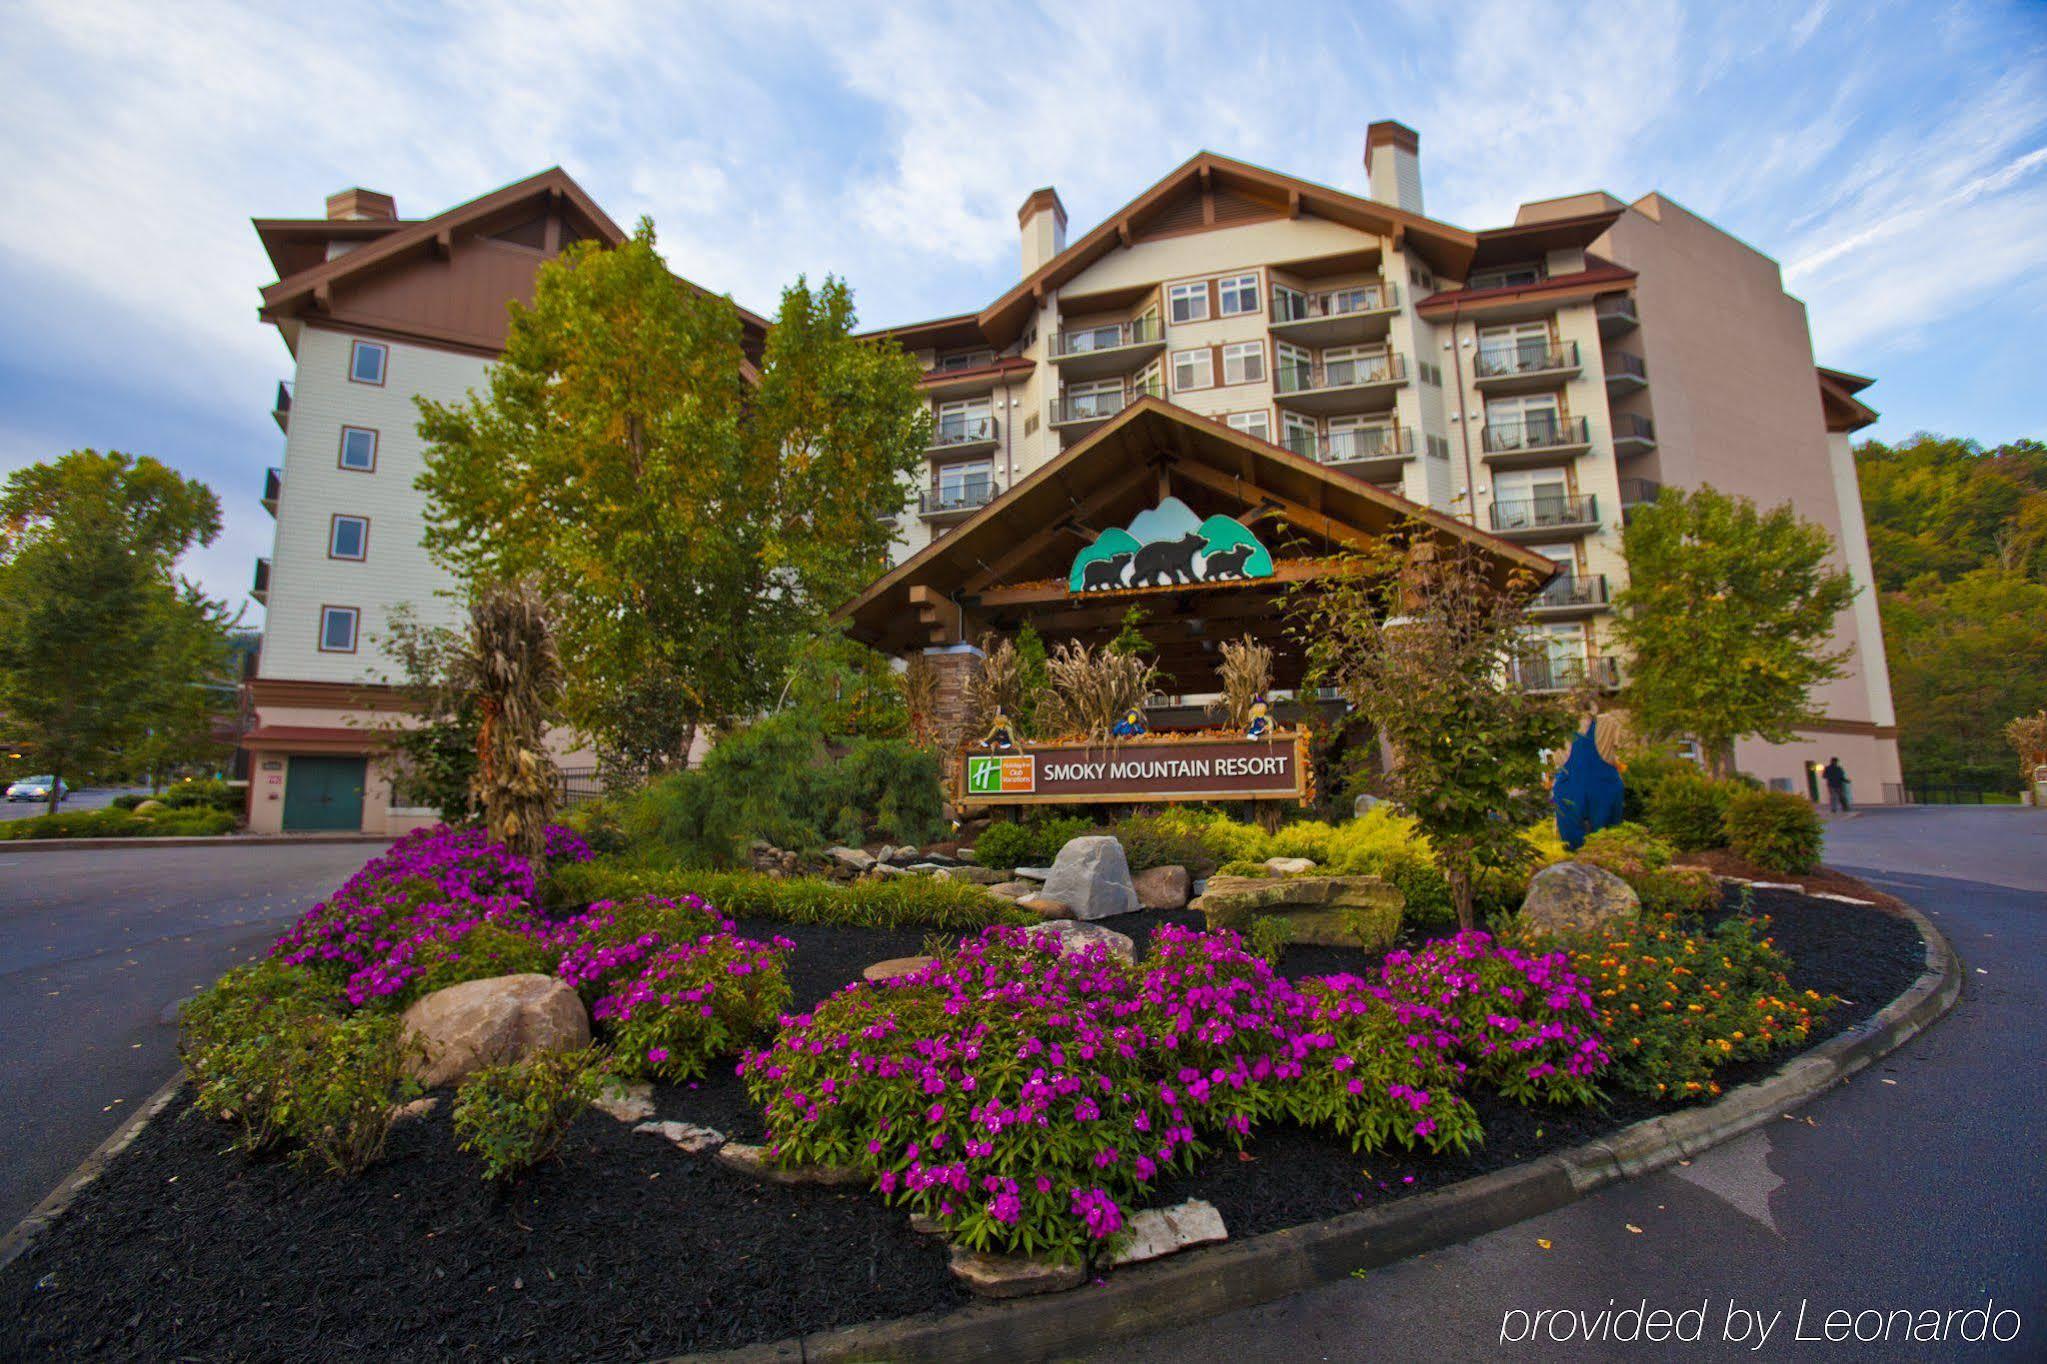 Holiday Inn Club Vacation Smoky Mountain